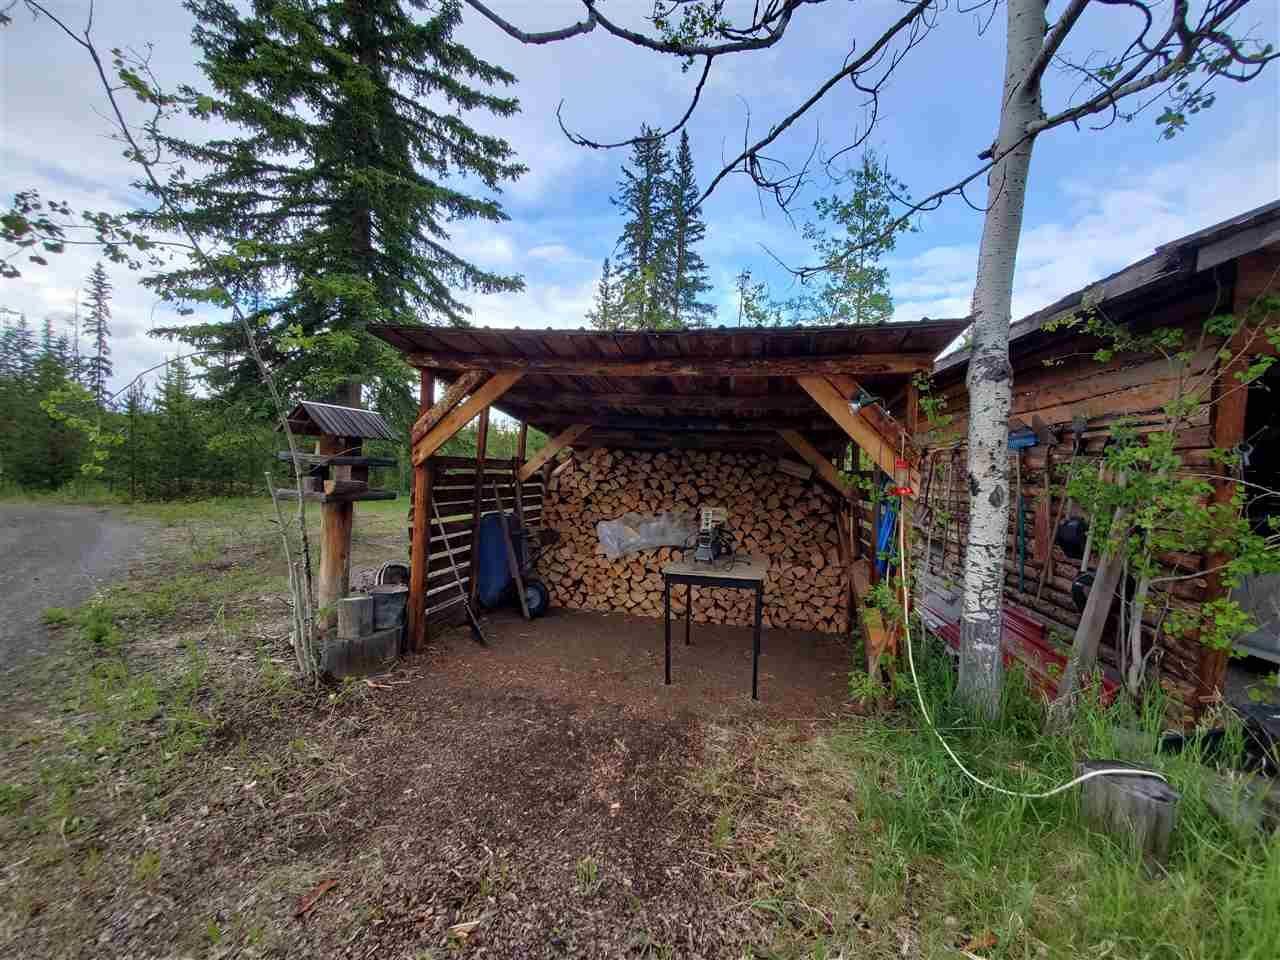 Photo 5: Photos: 9712 NAZKO Road: Bouchie Lake House for sale (Quesnel (Zone 28))  : MLS®# R2592064